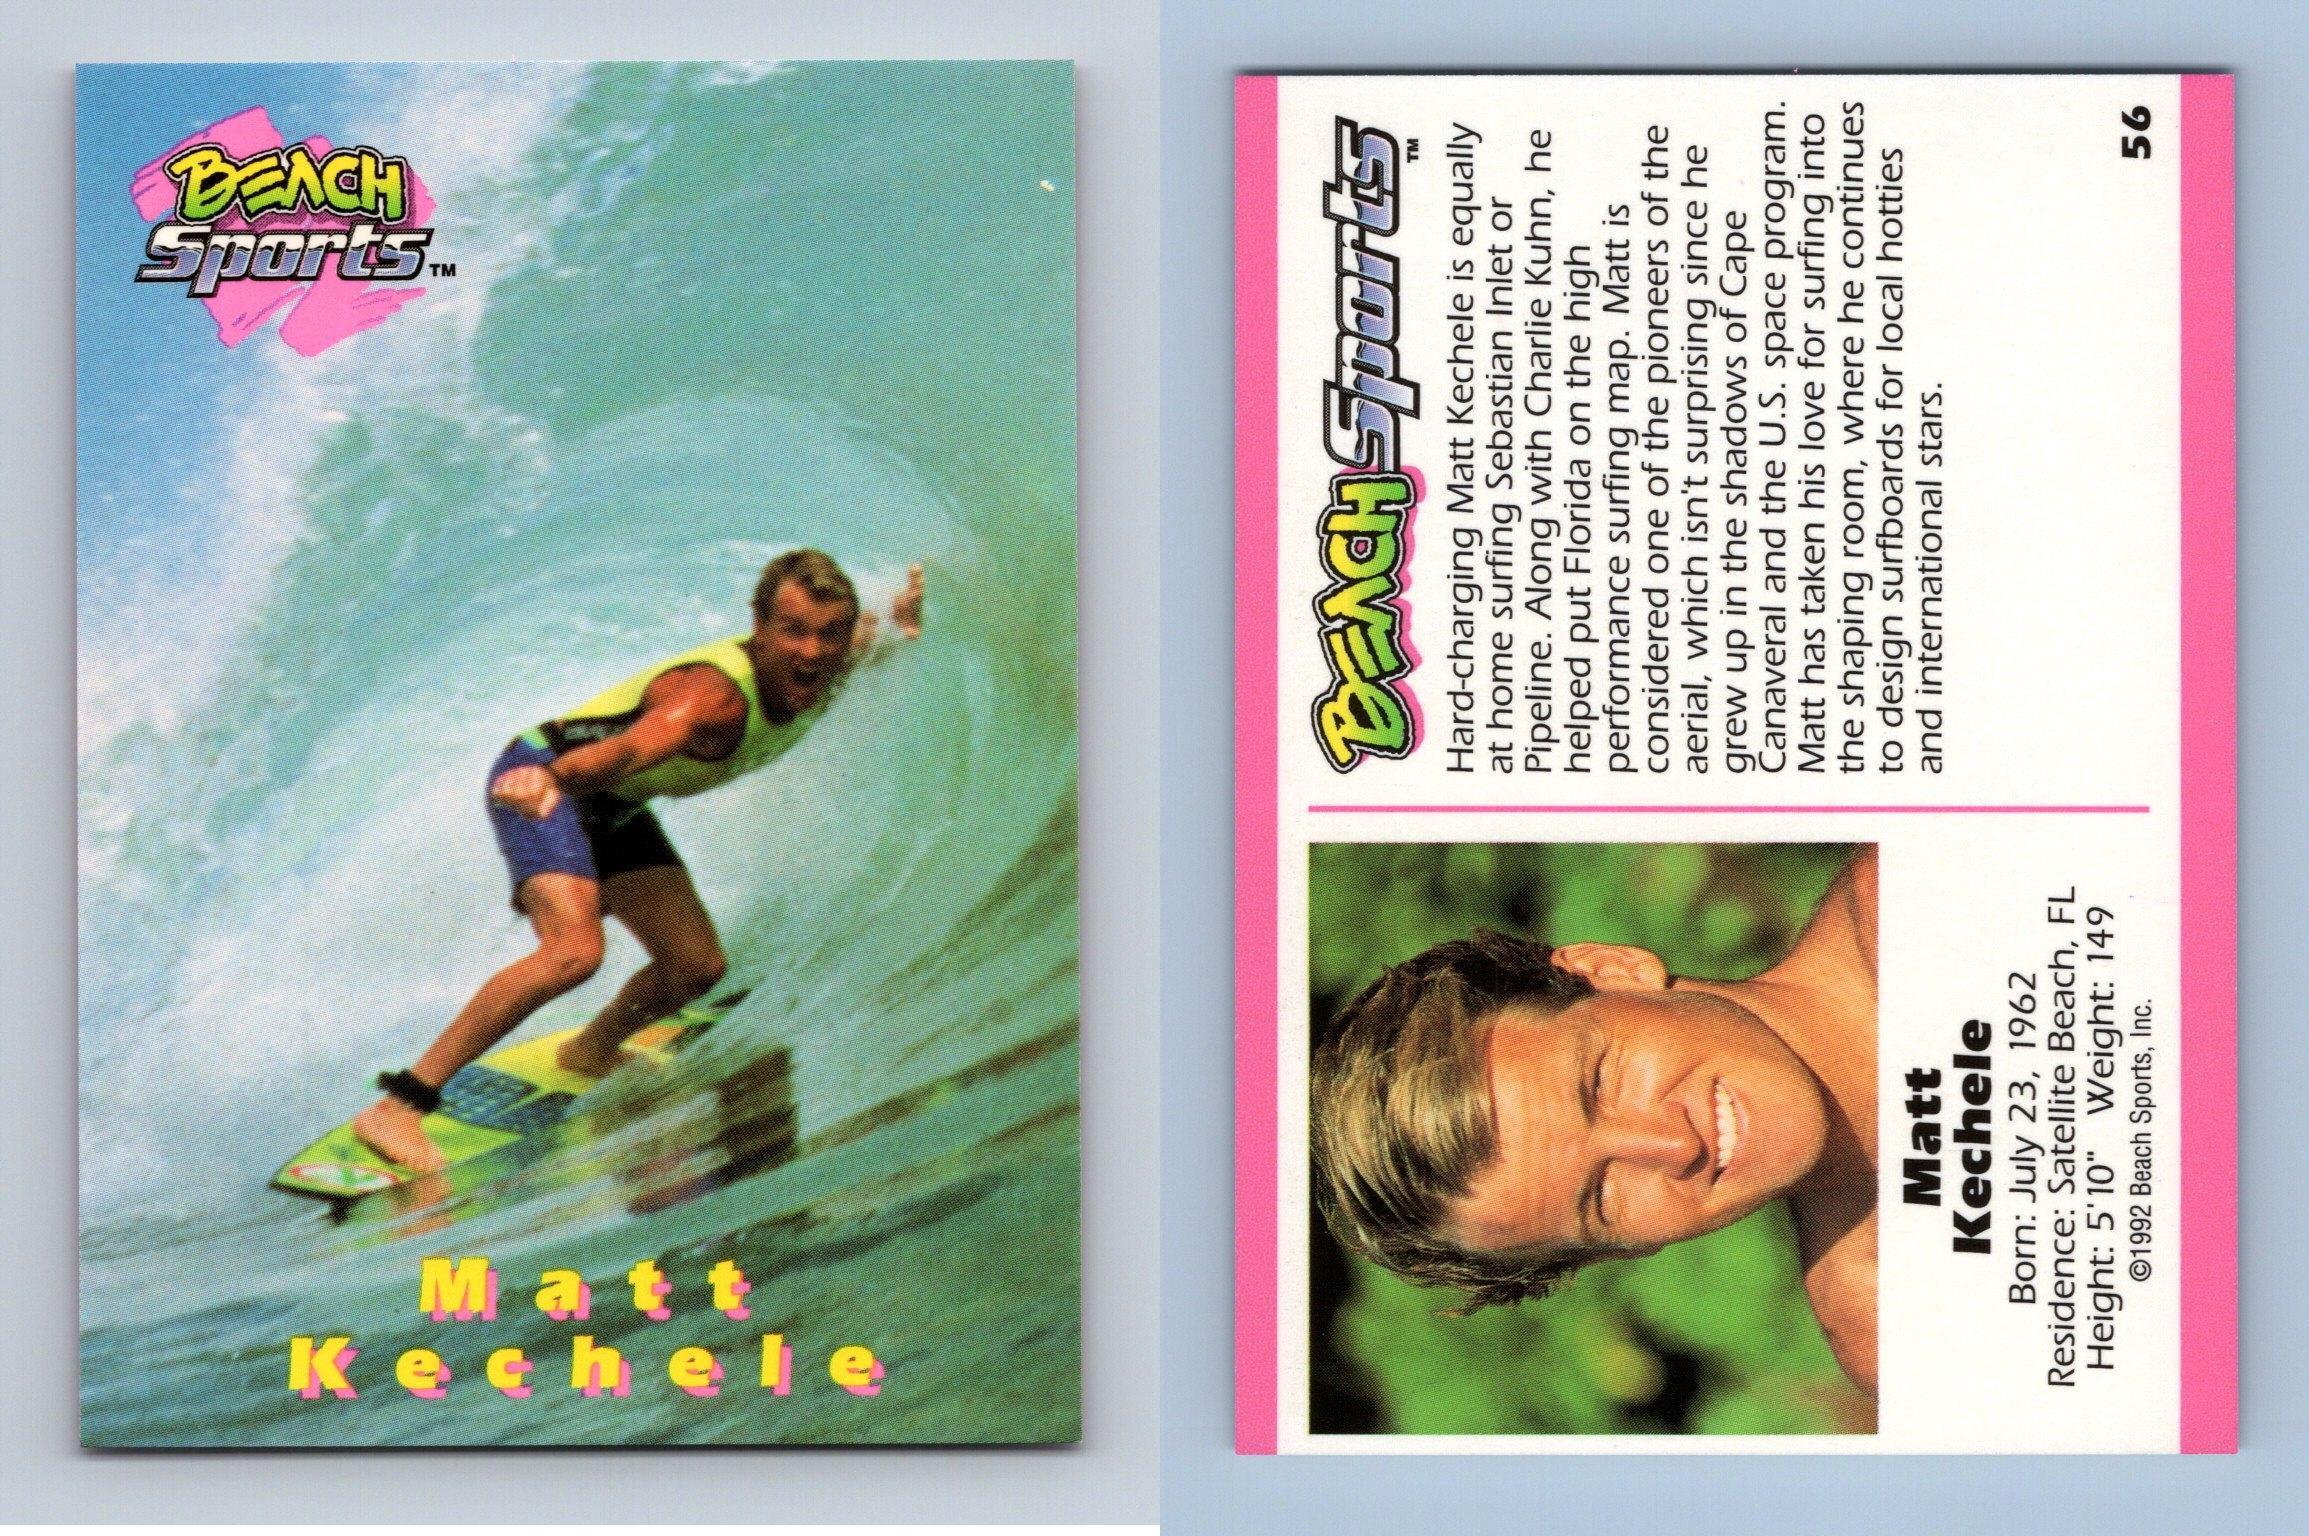 Owen McKibbin #13 Beach Sports 1992 Trading Card